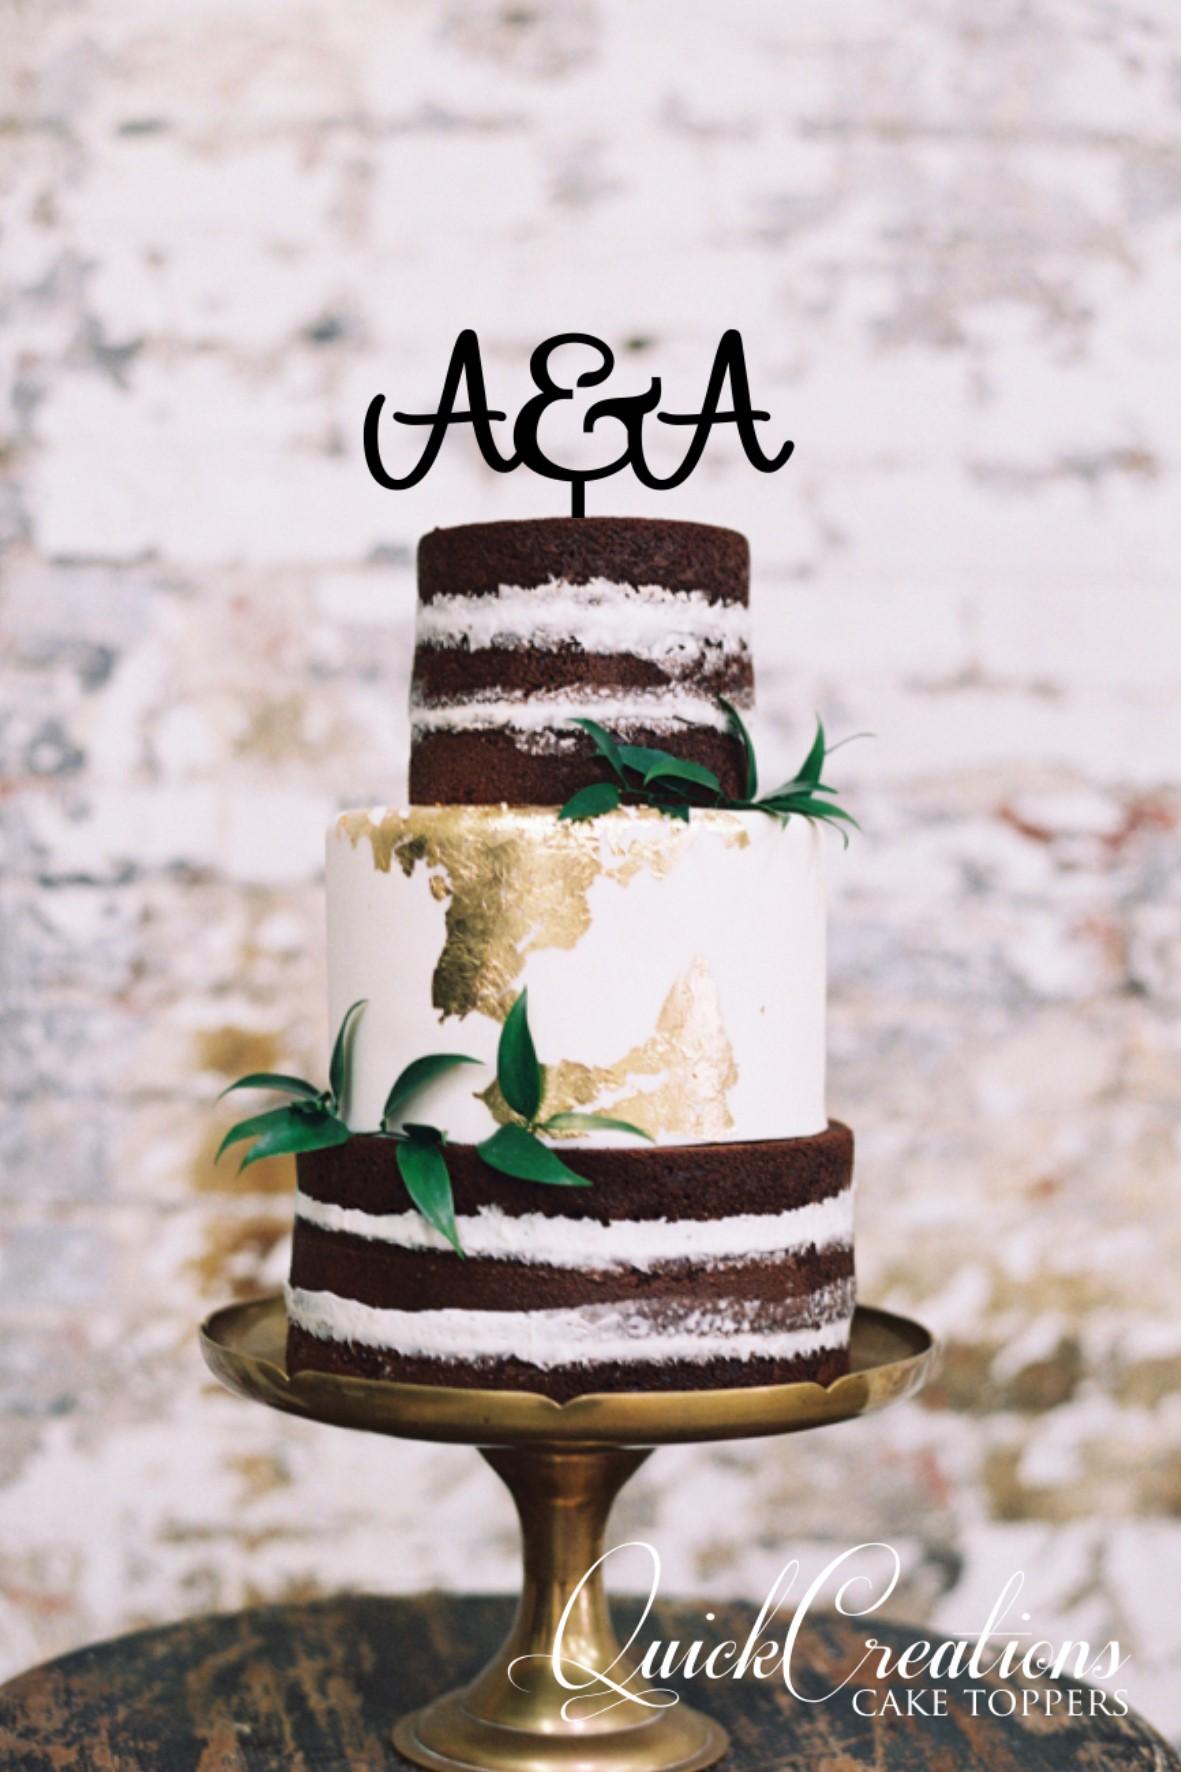 Quick Creations Cake Topper - A&A Initials